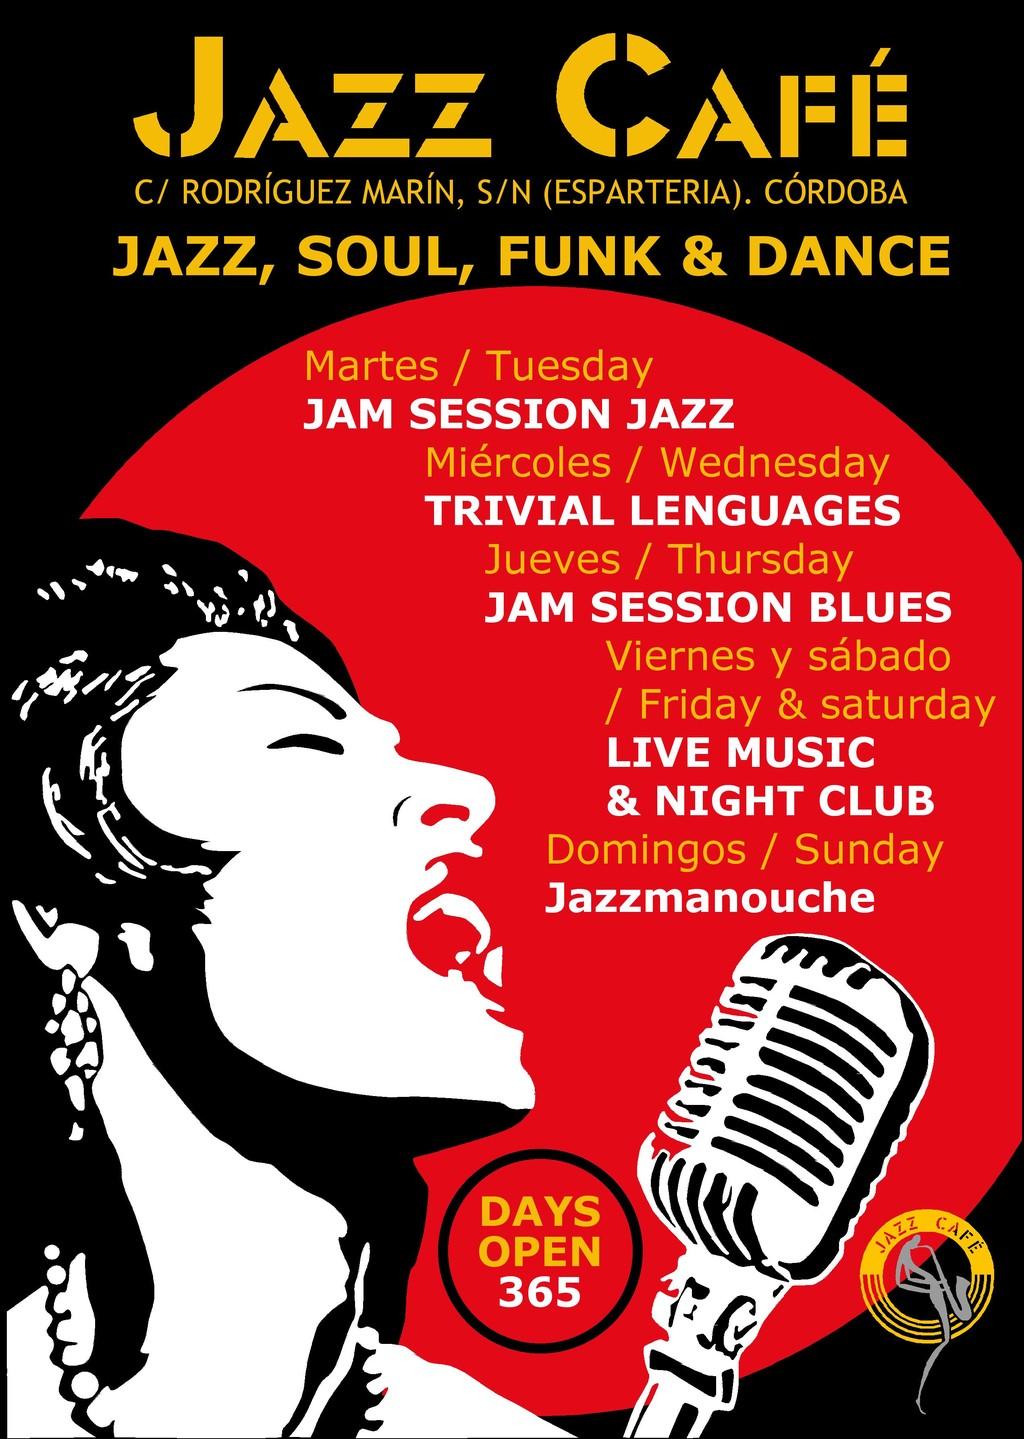 Local de jazz, soul, funk y dance